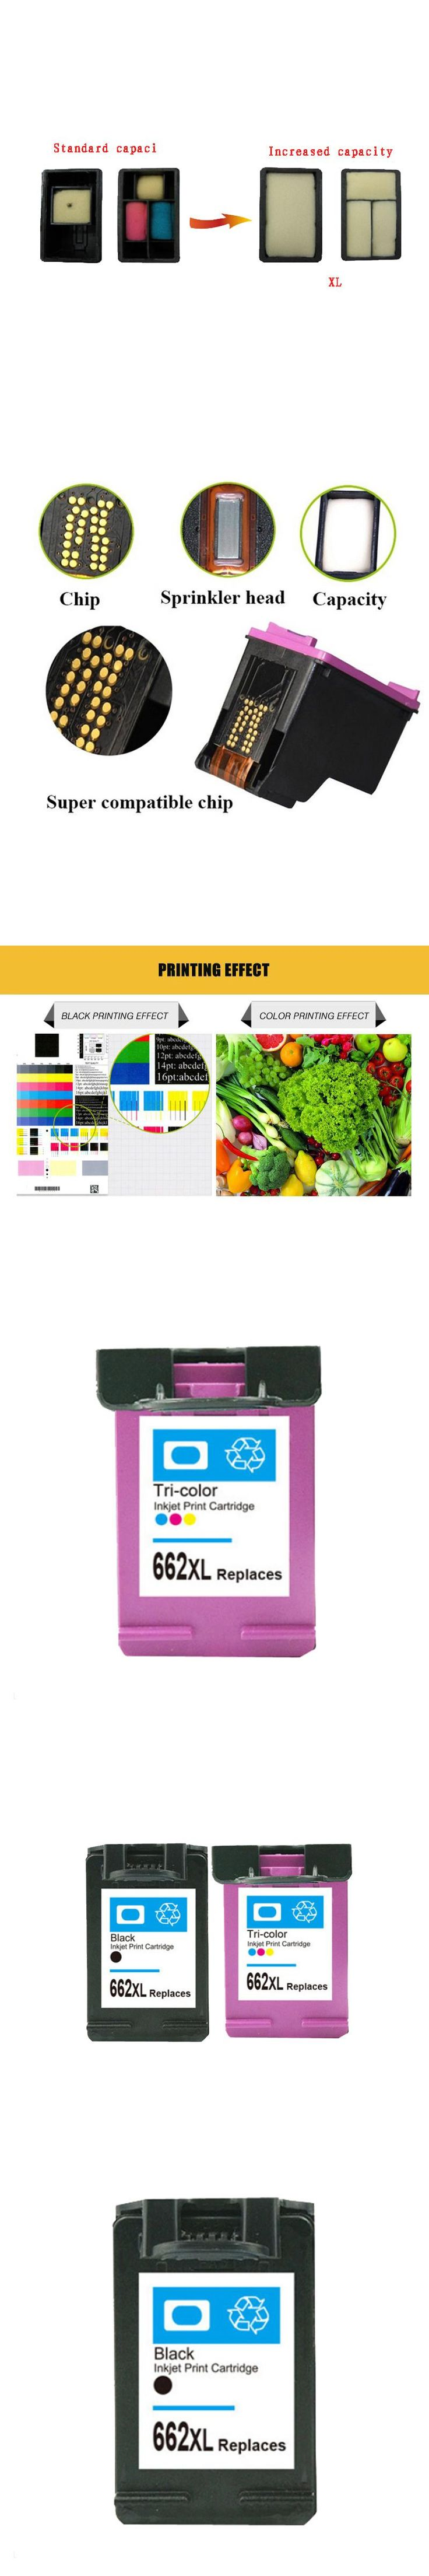 For HP 662 xl Ink Cartridge for HP662 662XL Deskjet 1515 1015 1018 1518 2645 3545